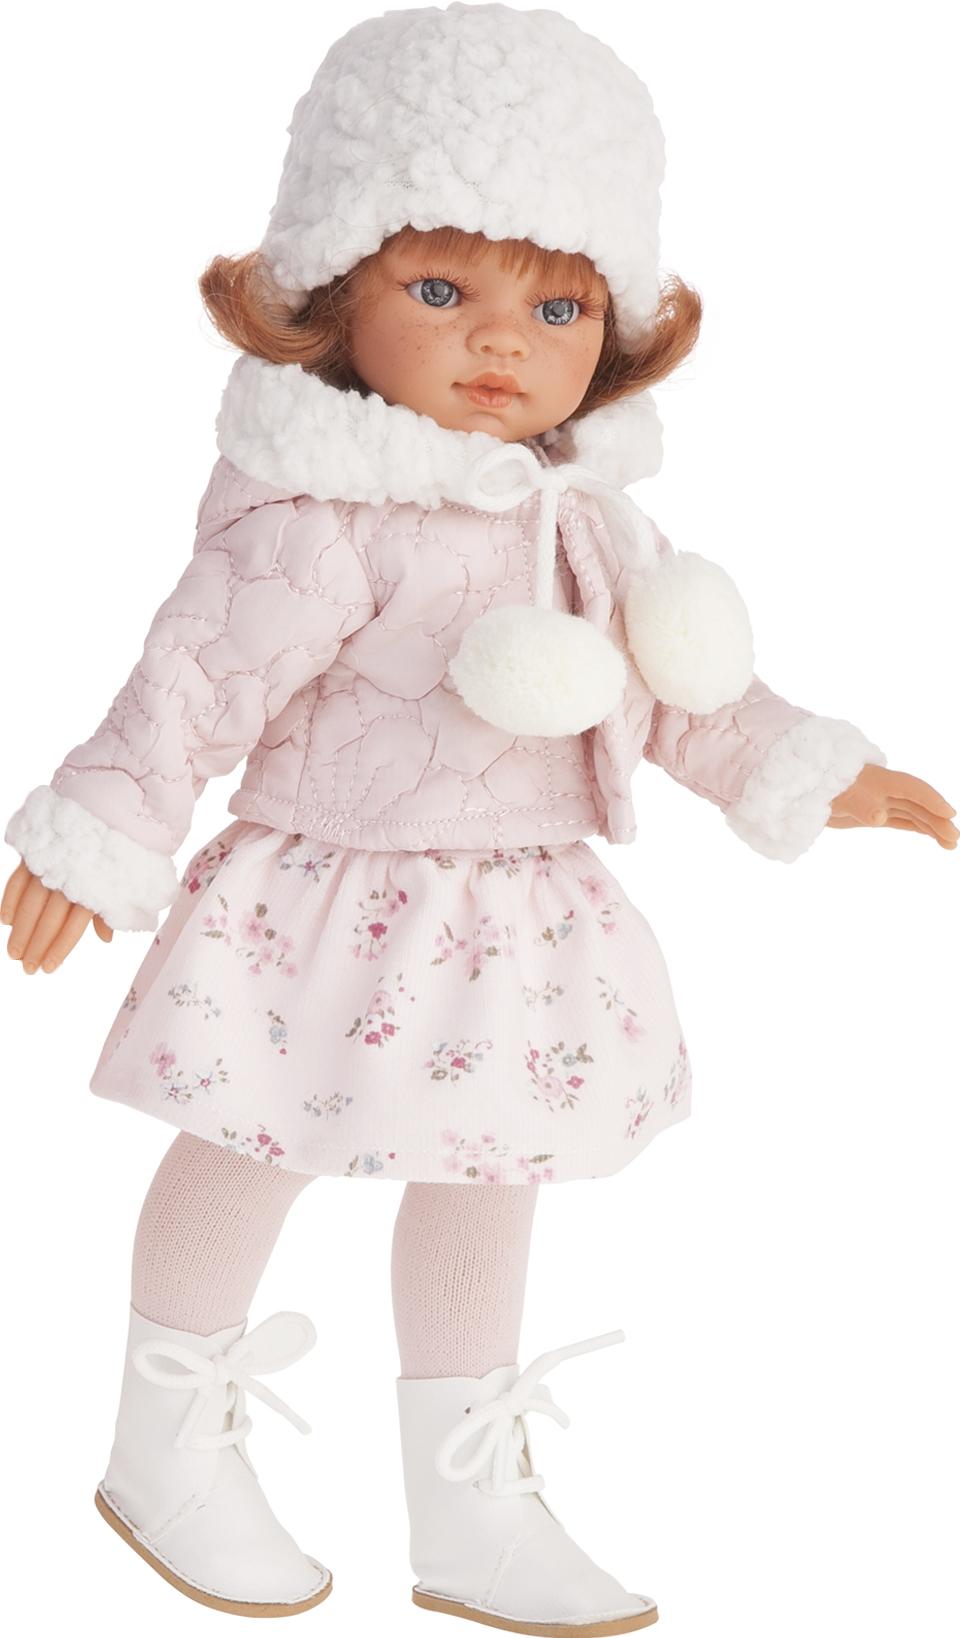 Кукла Эльвира зимний образ, рыжая, 33 см.Куклы Антонио Хуан (Antonio Juan Munecas)<br>Кукла Эльвира зимний образ, рыжая, 33 см.<br>